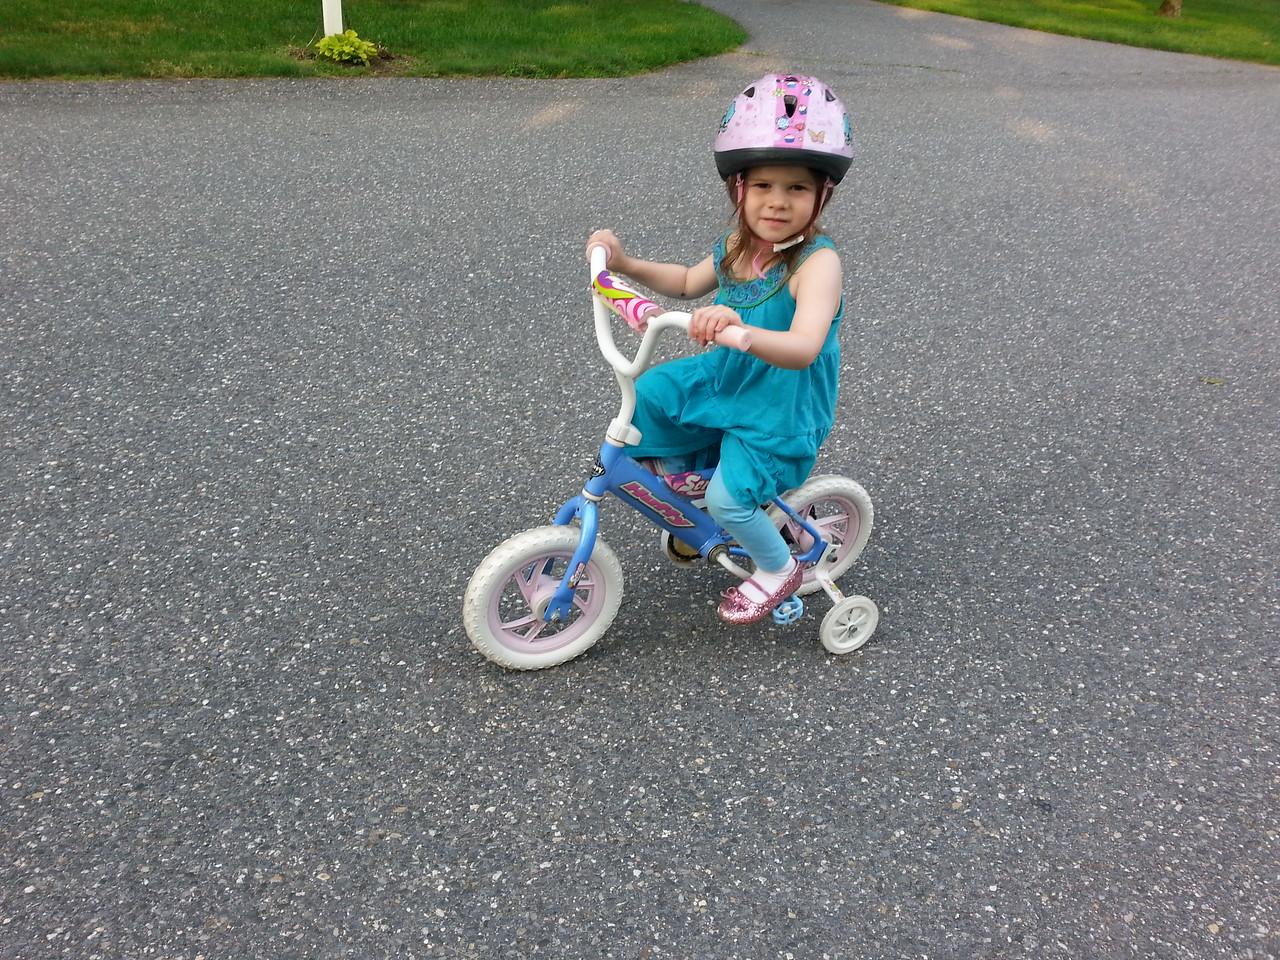 Cycling the 'hood